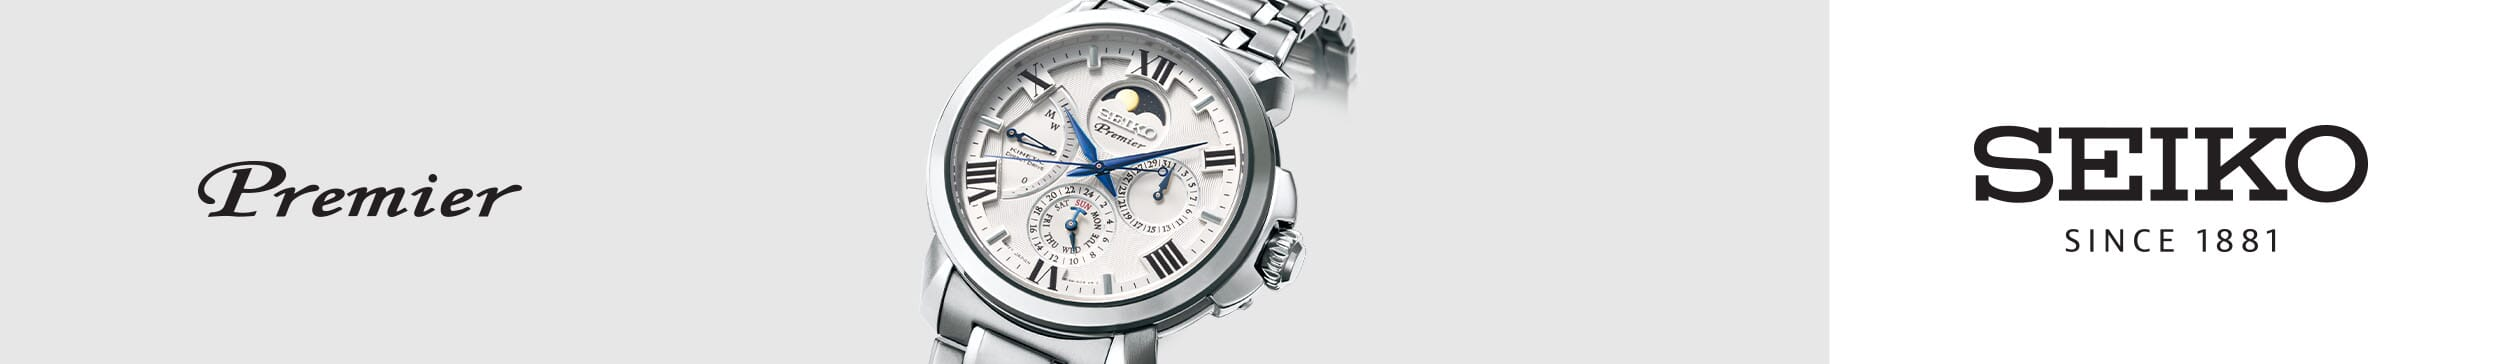 Seiko Premier Horloges